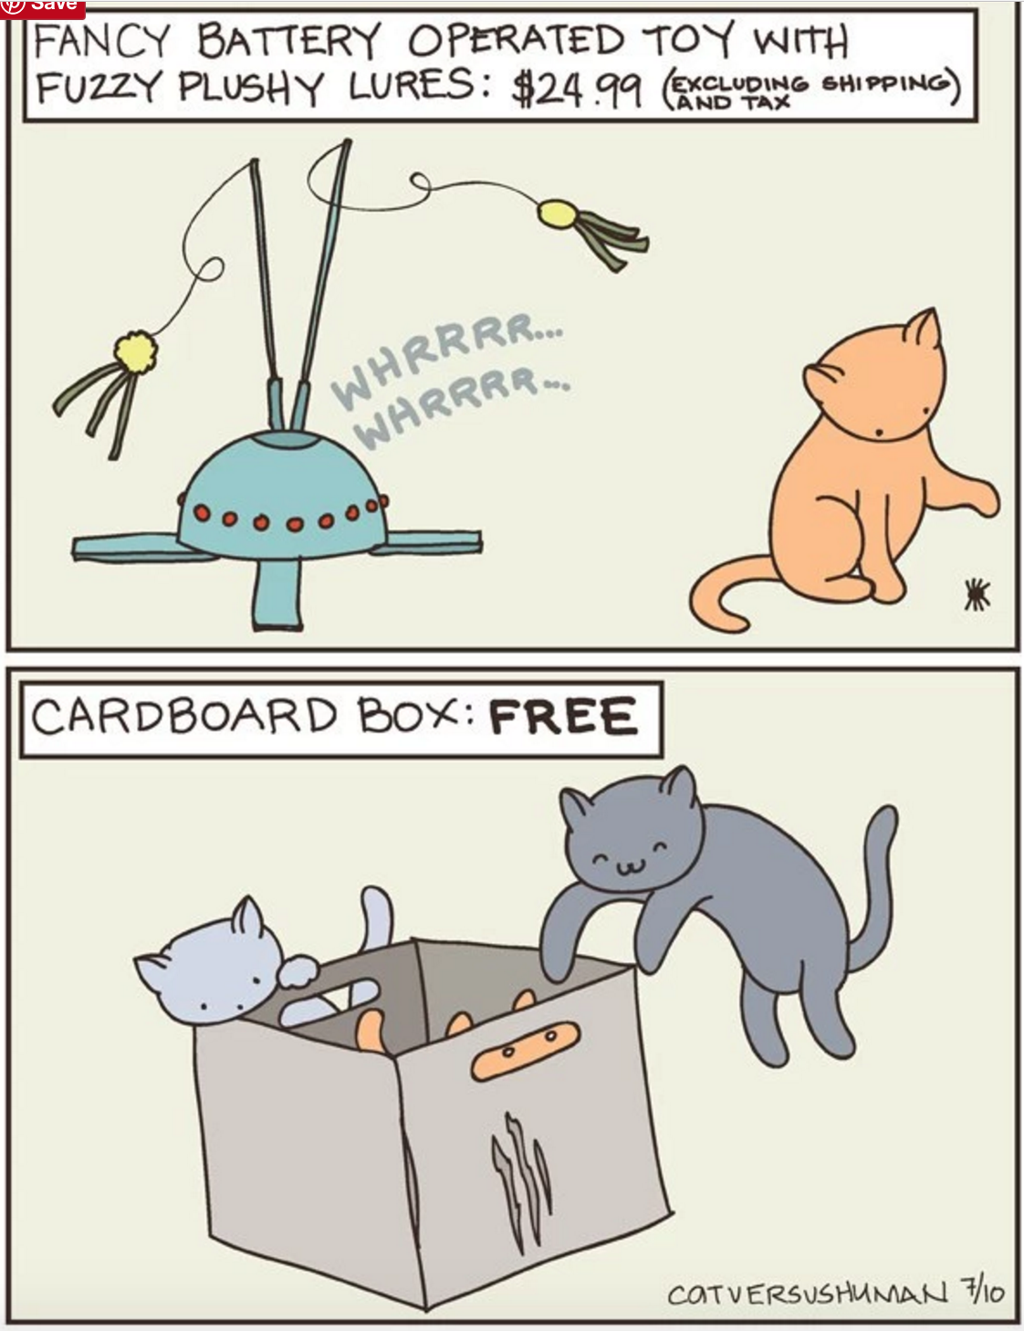 owning a kitten